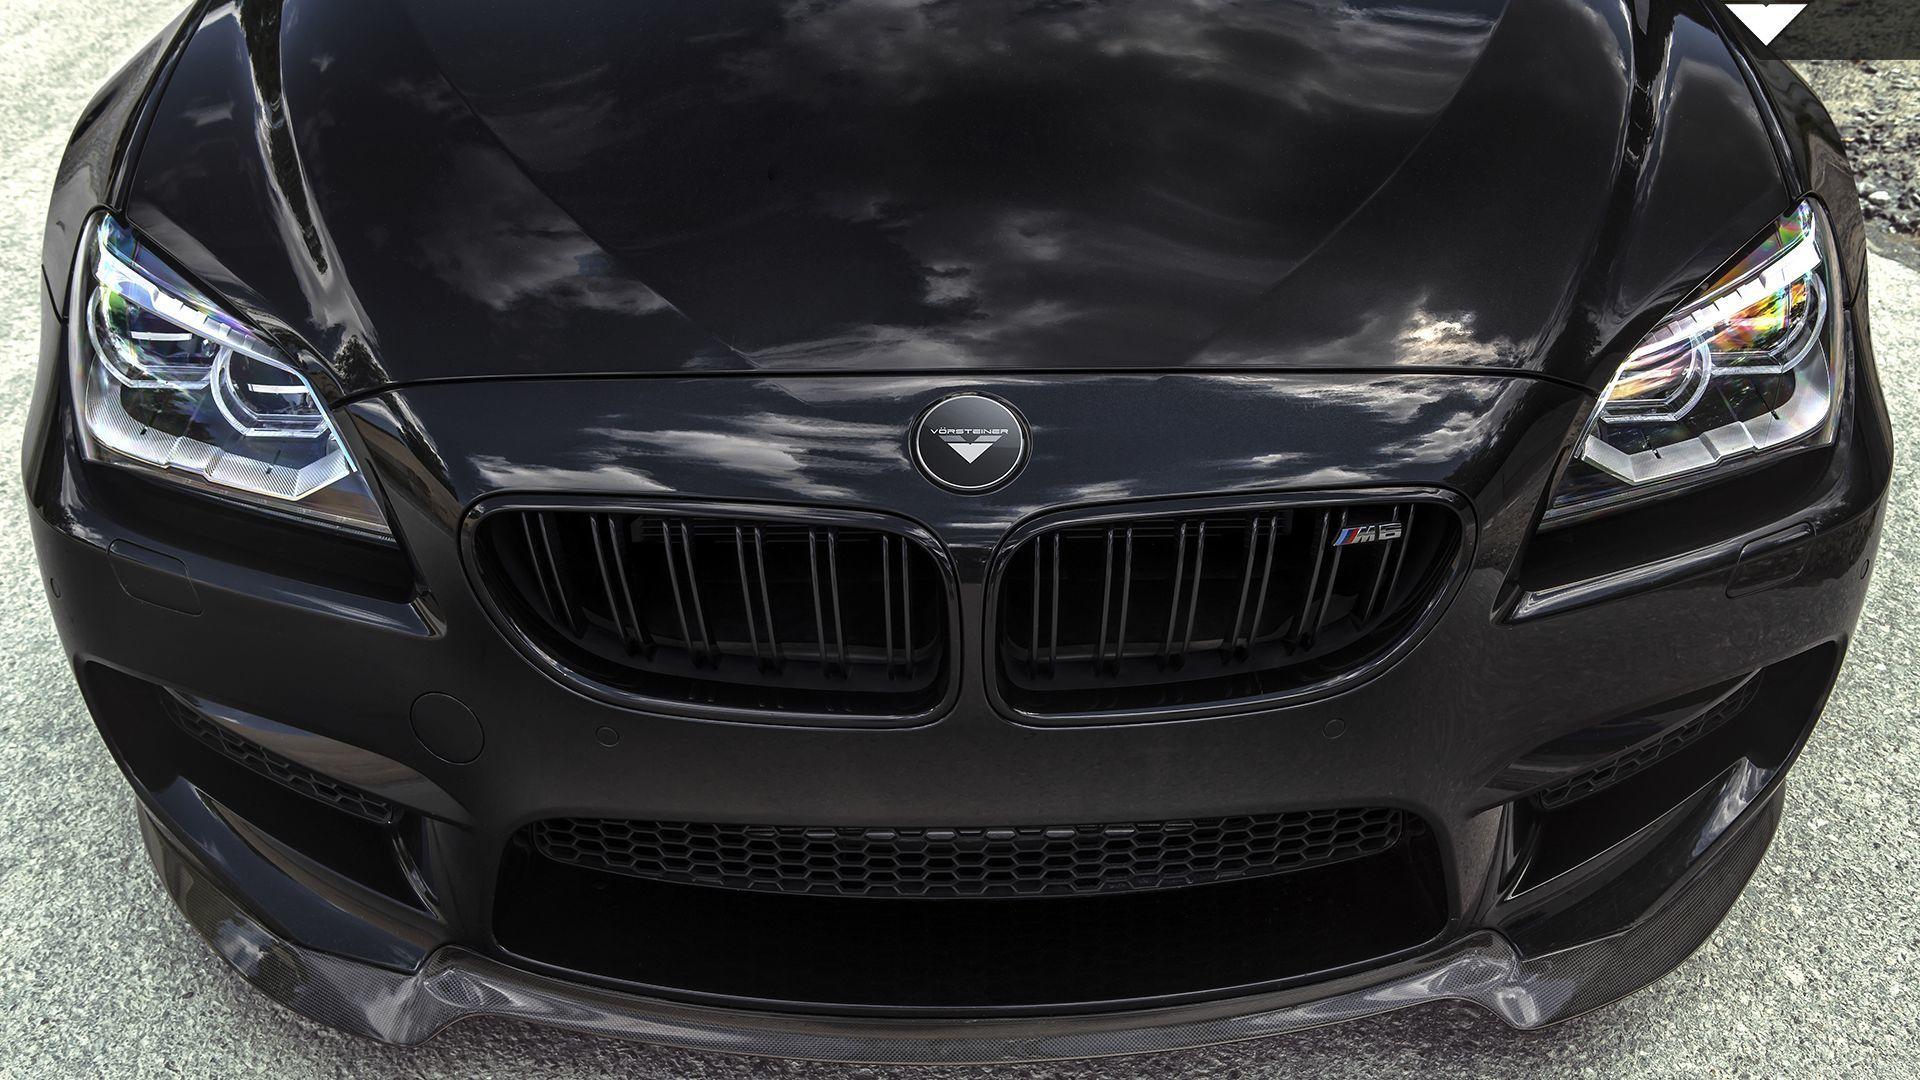 VORSTEINER STYLE CARBON front bumper SPOILER FOR BMW M6 NEW MODEL